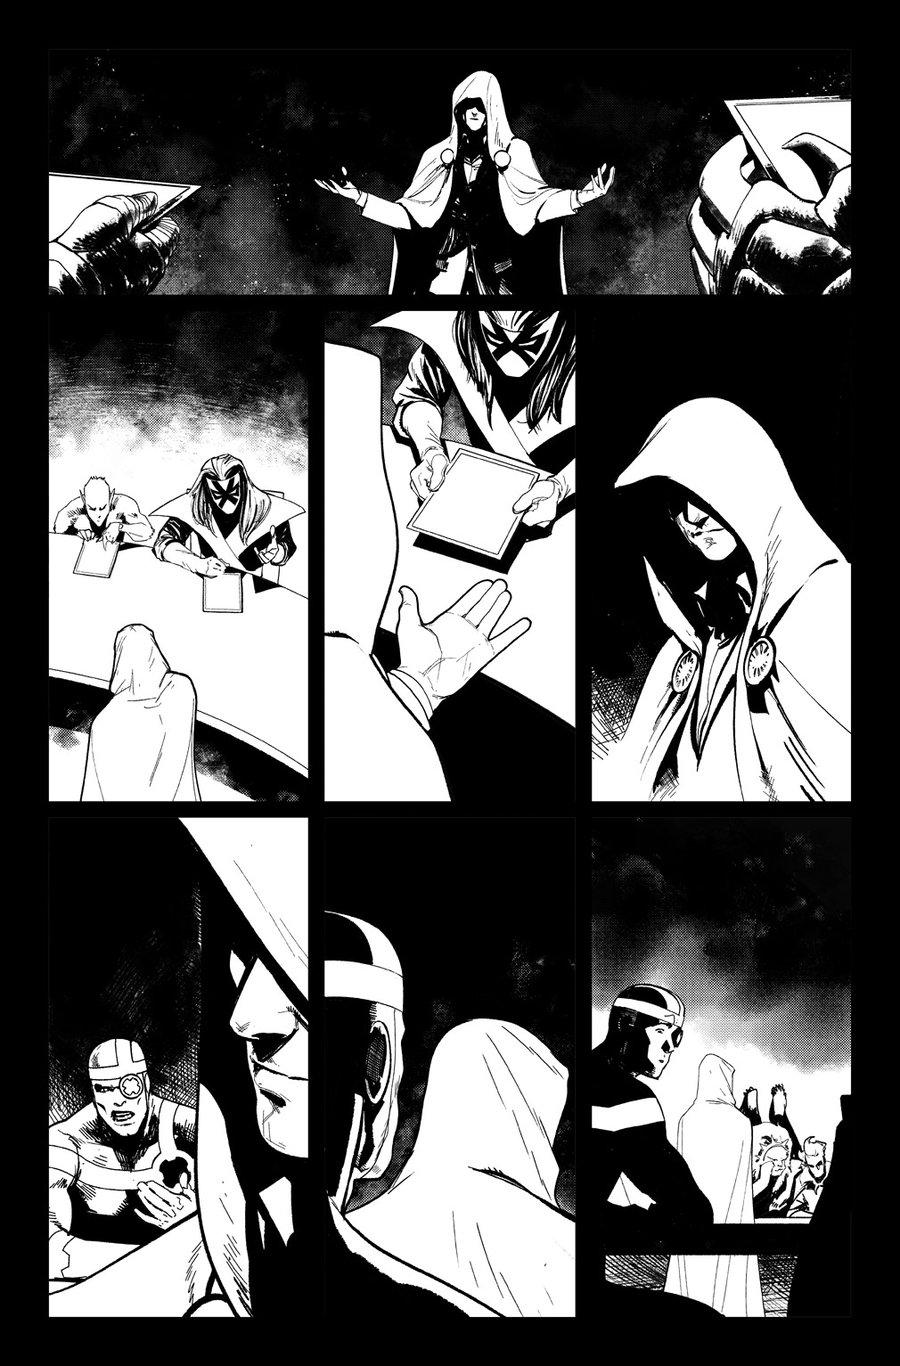 Image of DEFENDERS #10, p.18 ARTIST'S PROOF